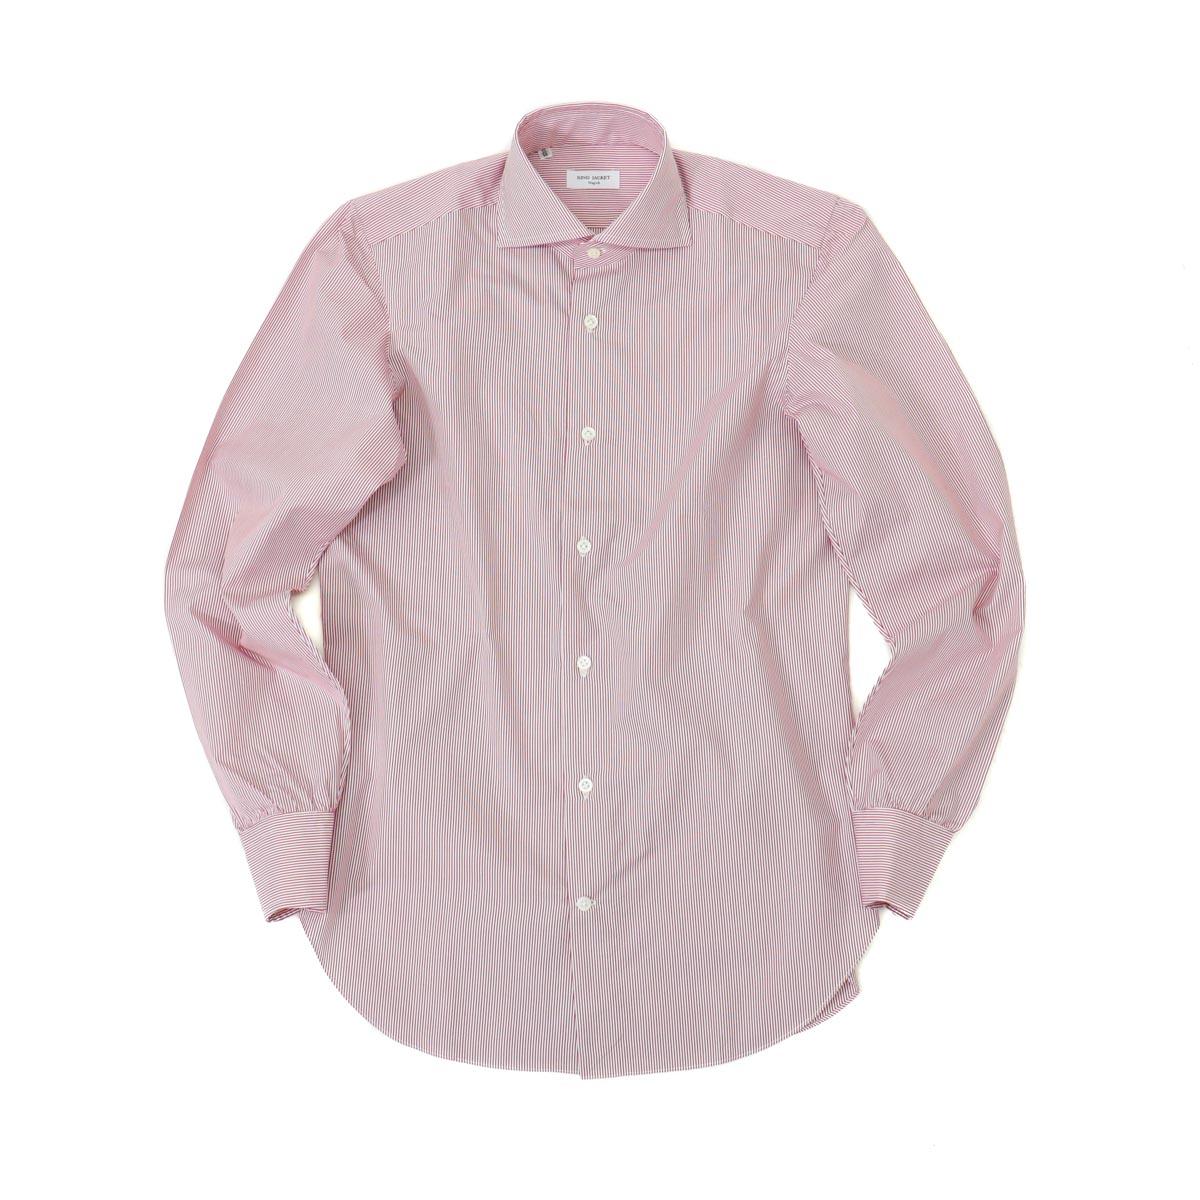 RING JACKET Napoli 12ポイントハンド ワイドカラーシャツ 【ストライプ / レッド】